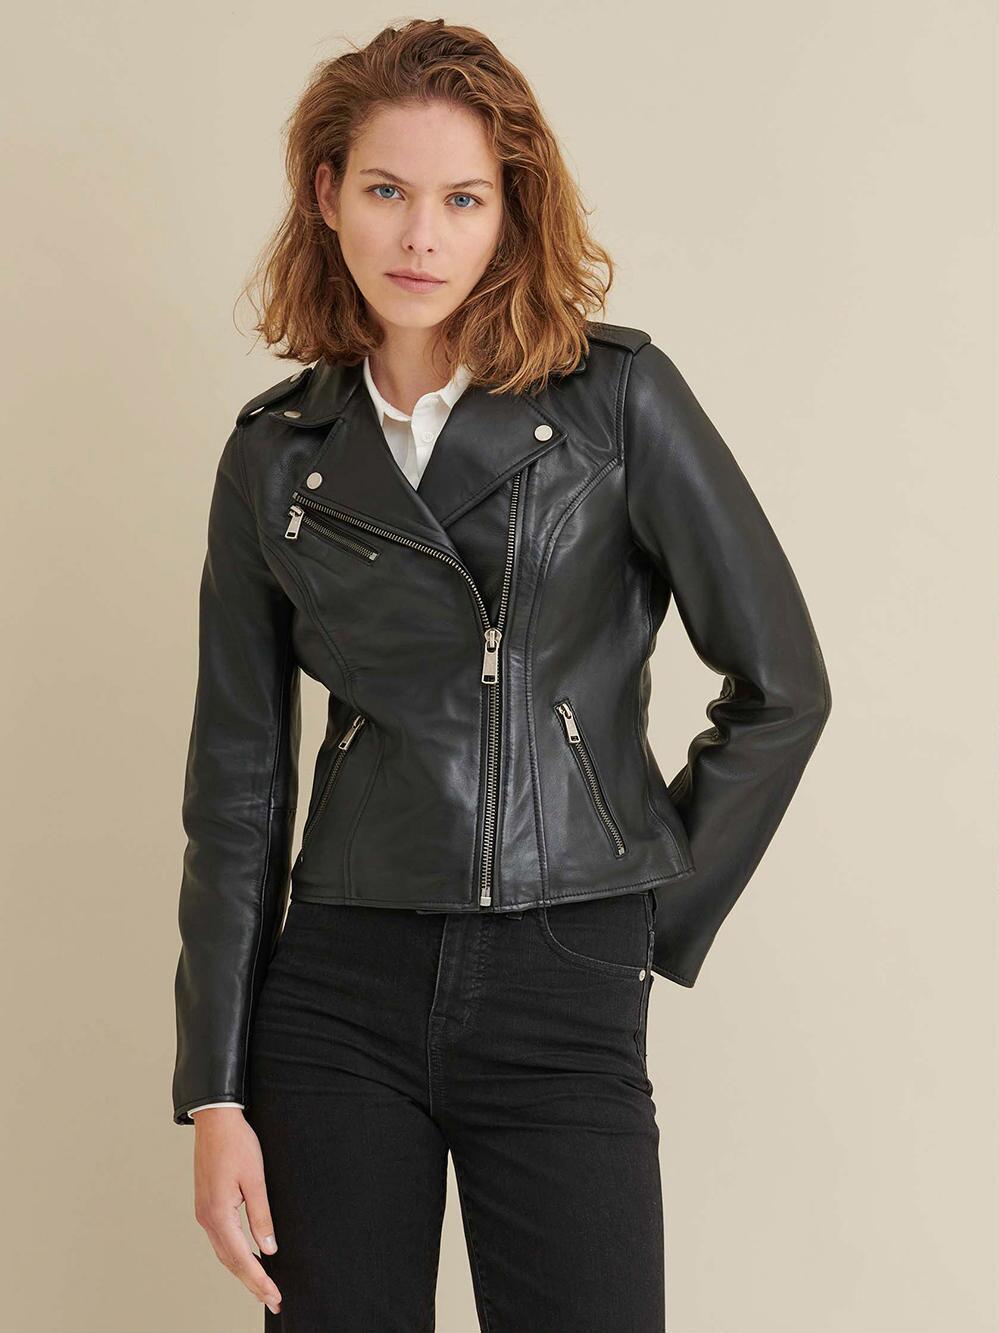 Madeline Asymmetrical Leather Jacket V2 Asymmetrical Leather Jacket Leather Jacket Leather Jacket Girl [ 1333 x 999 Pixel ]